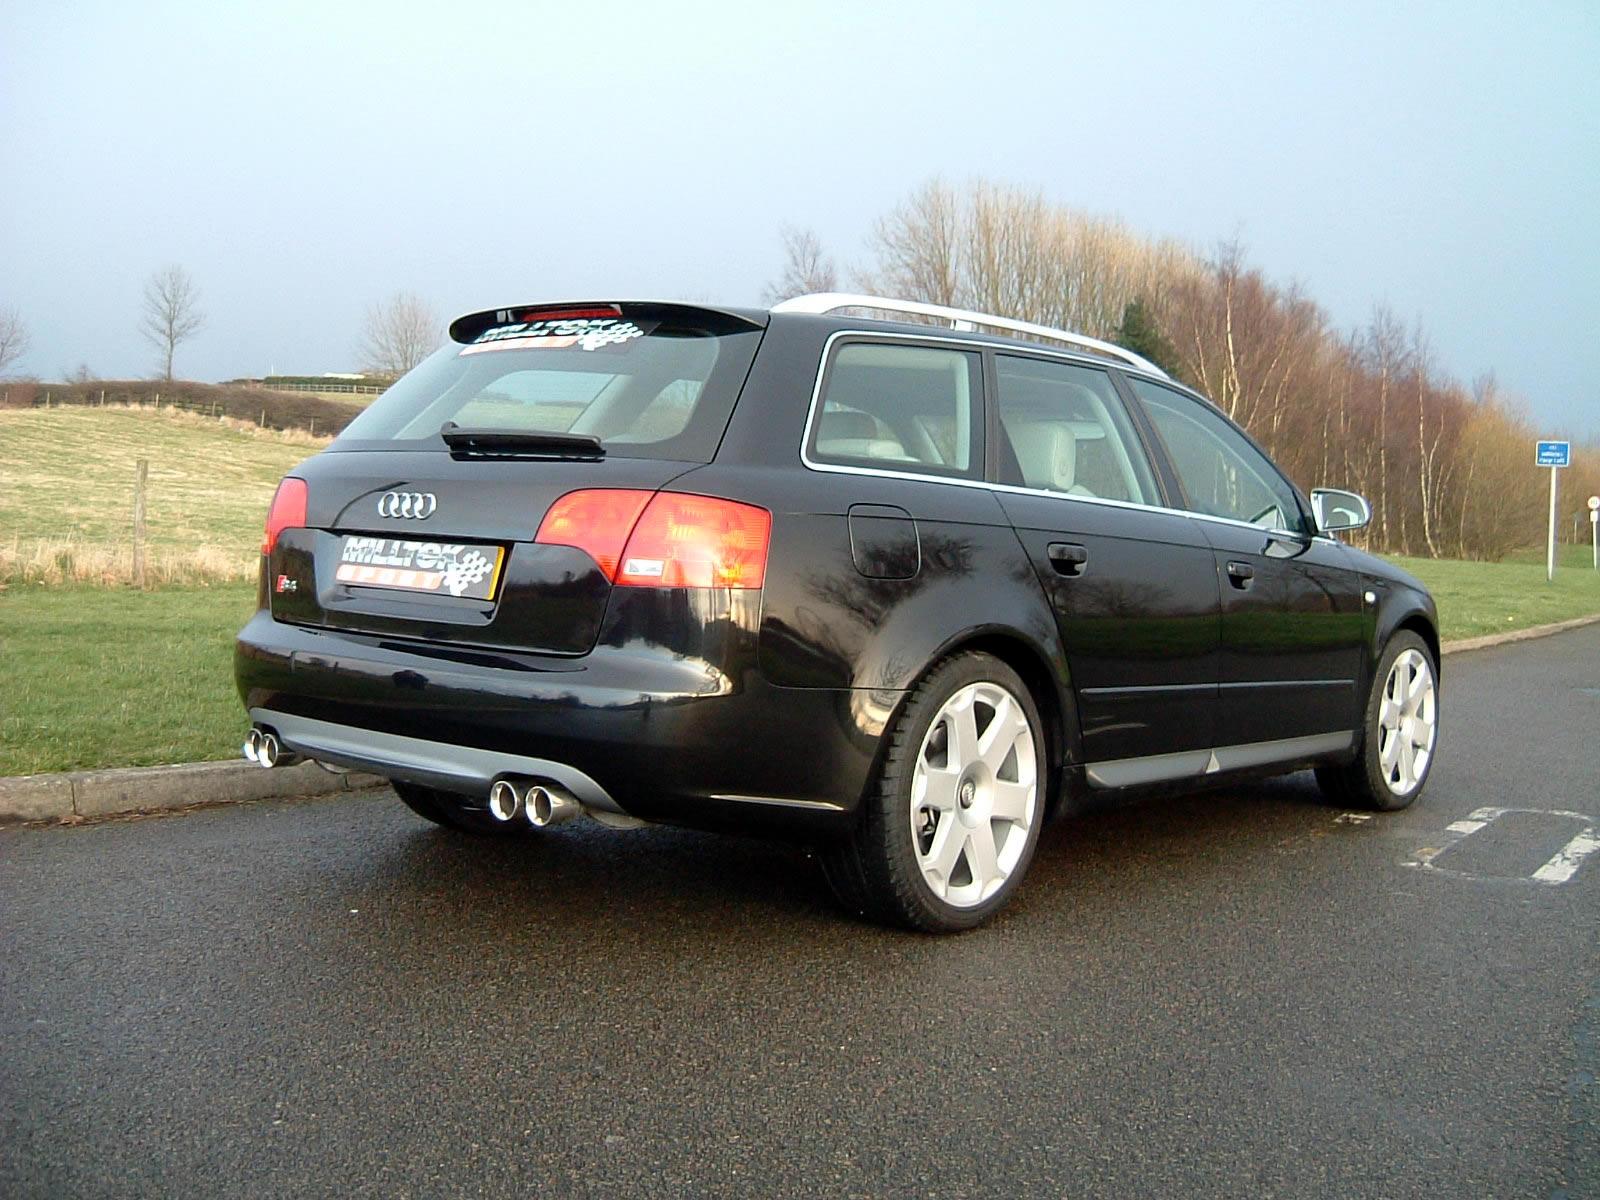 Audi-S4-B7-10